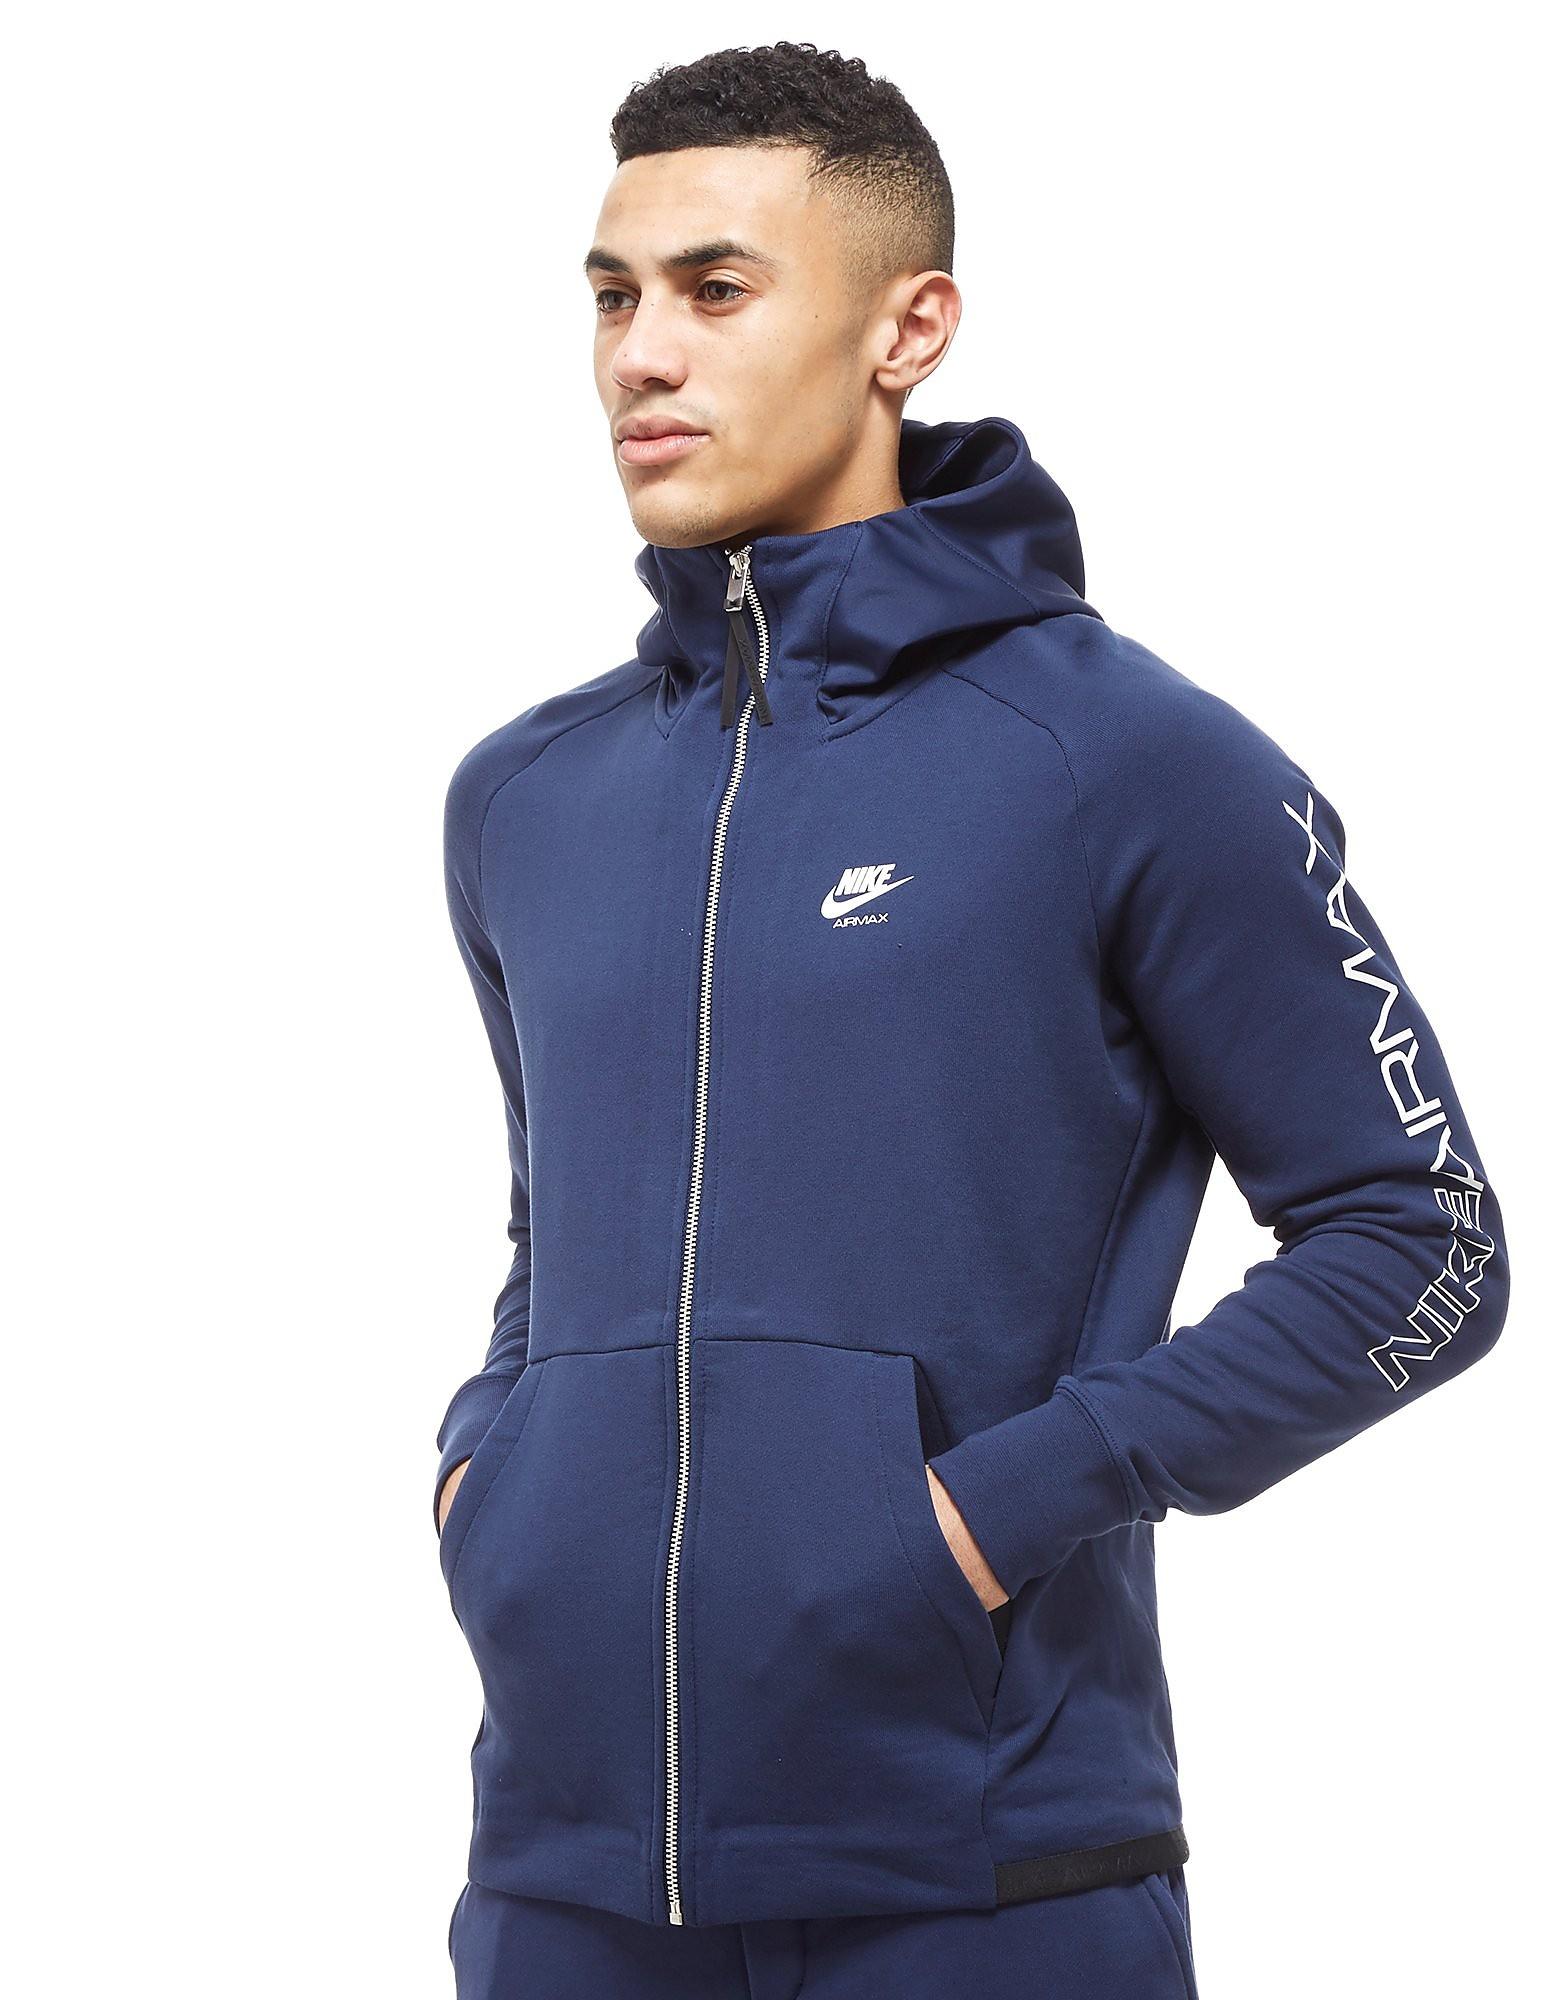 Nike Sweat Air Max Full Zip Homme